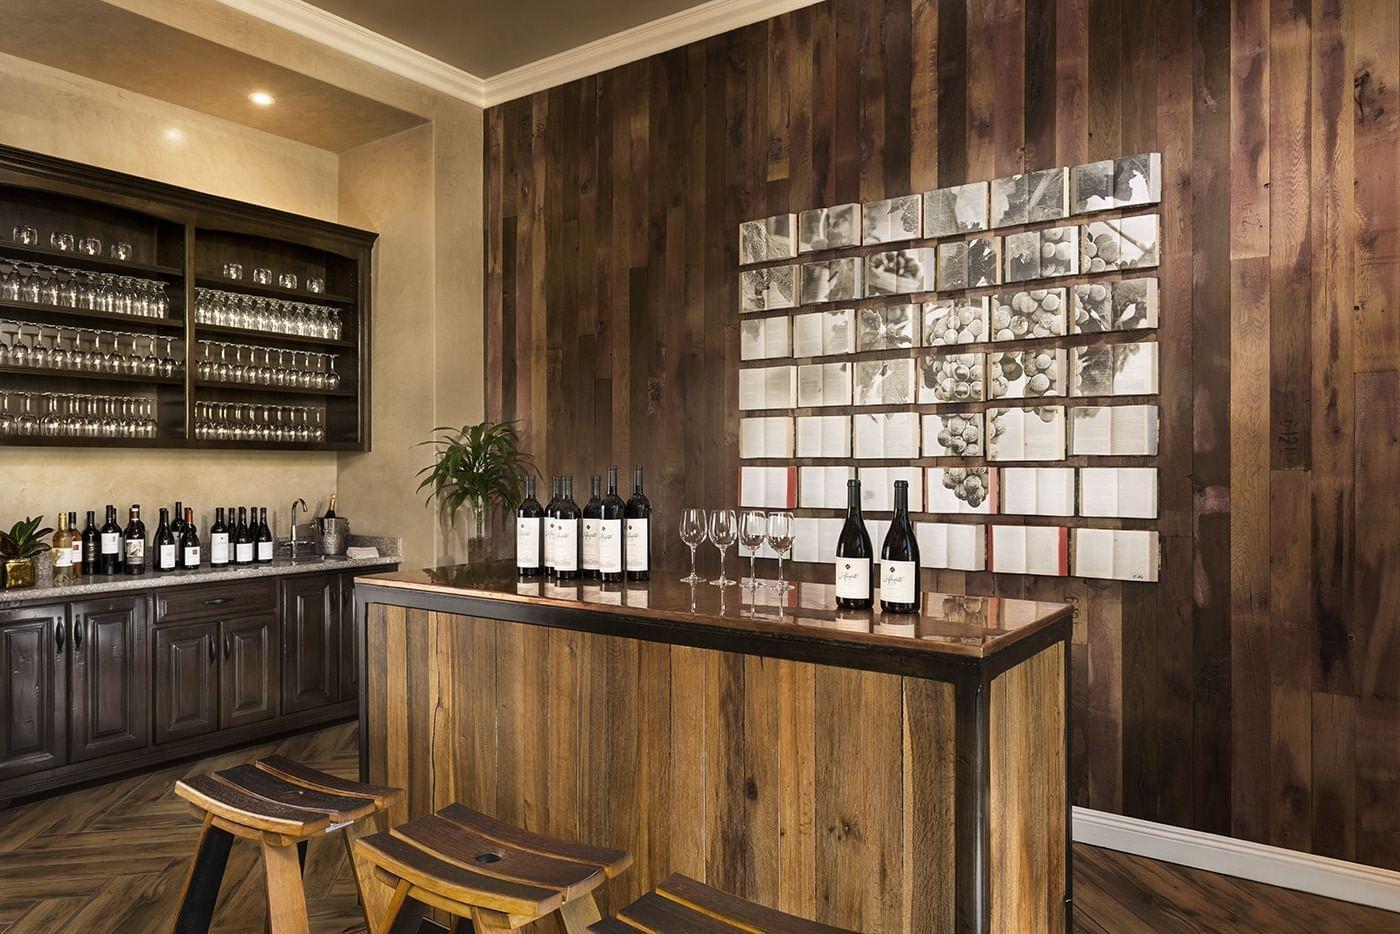 Willow Creek Tasting Room